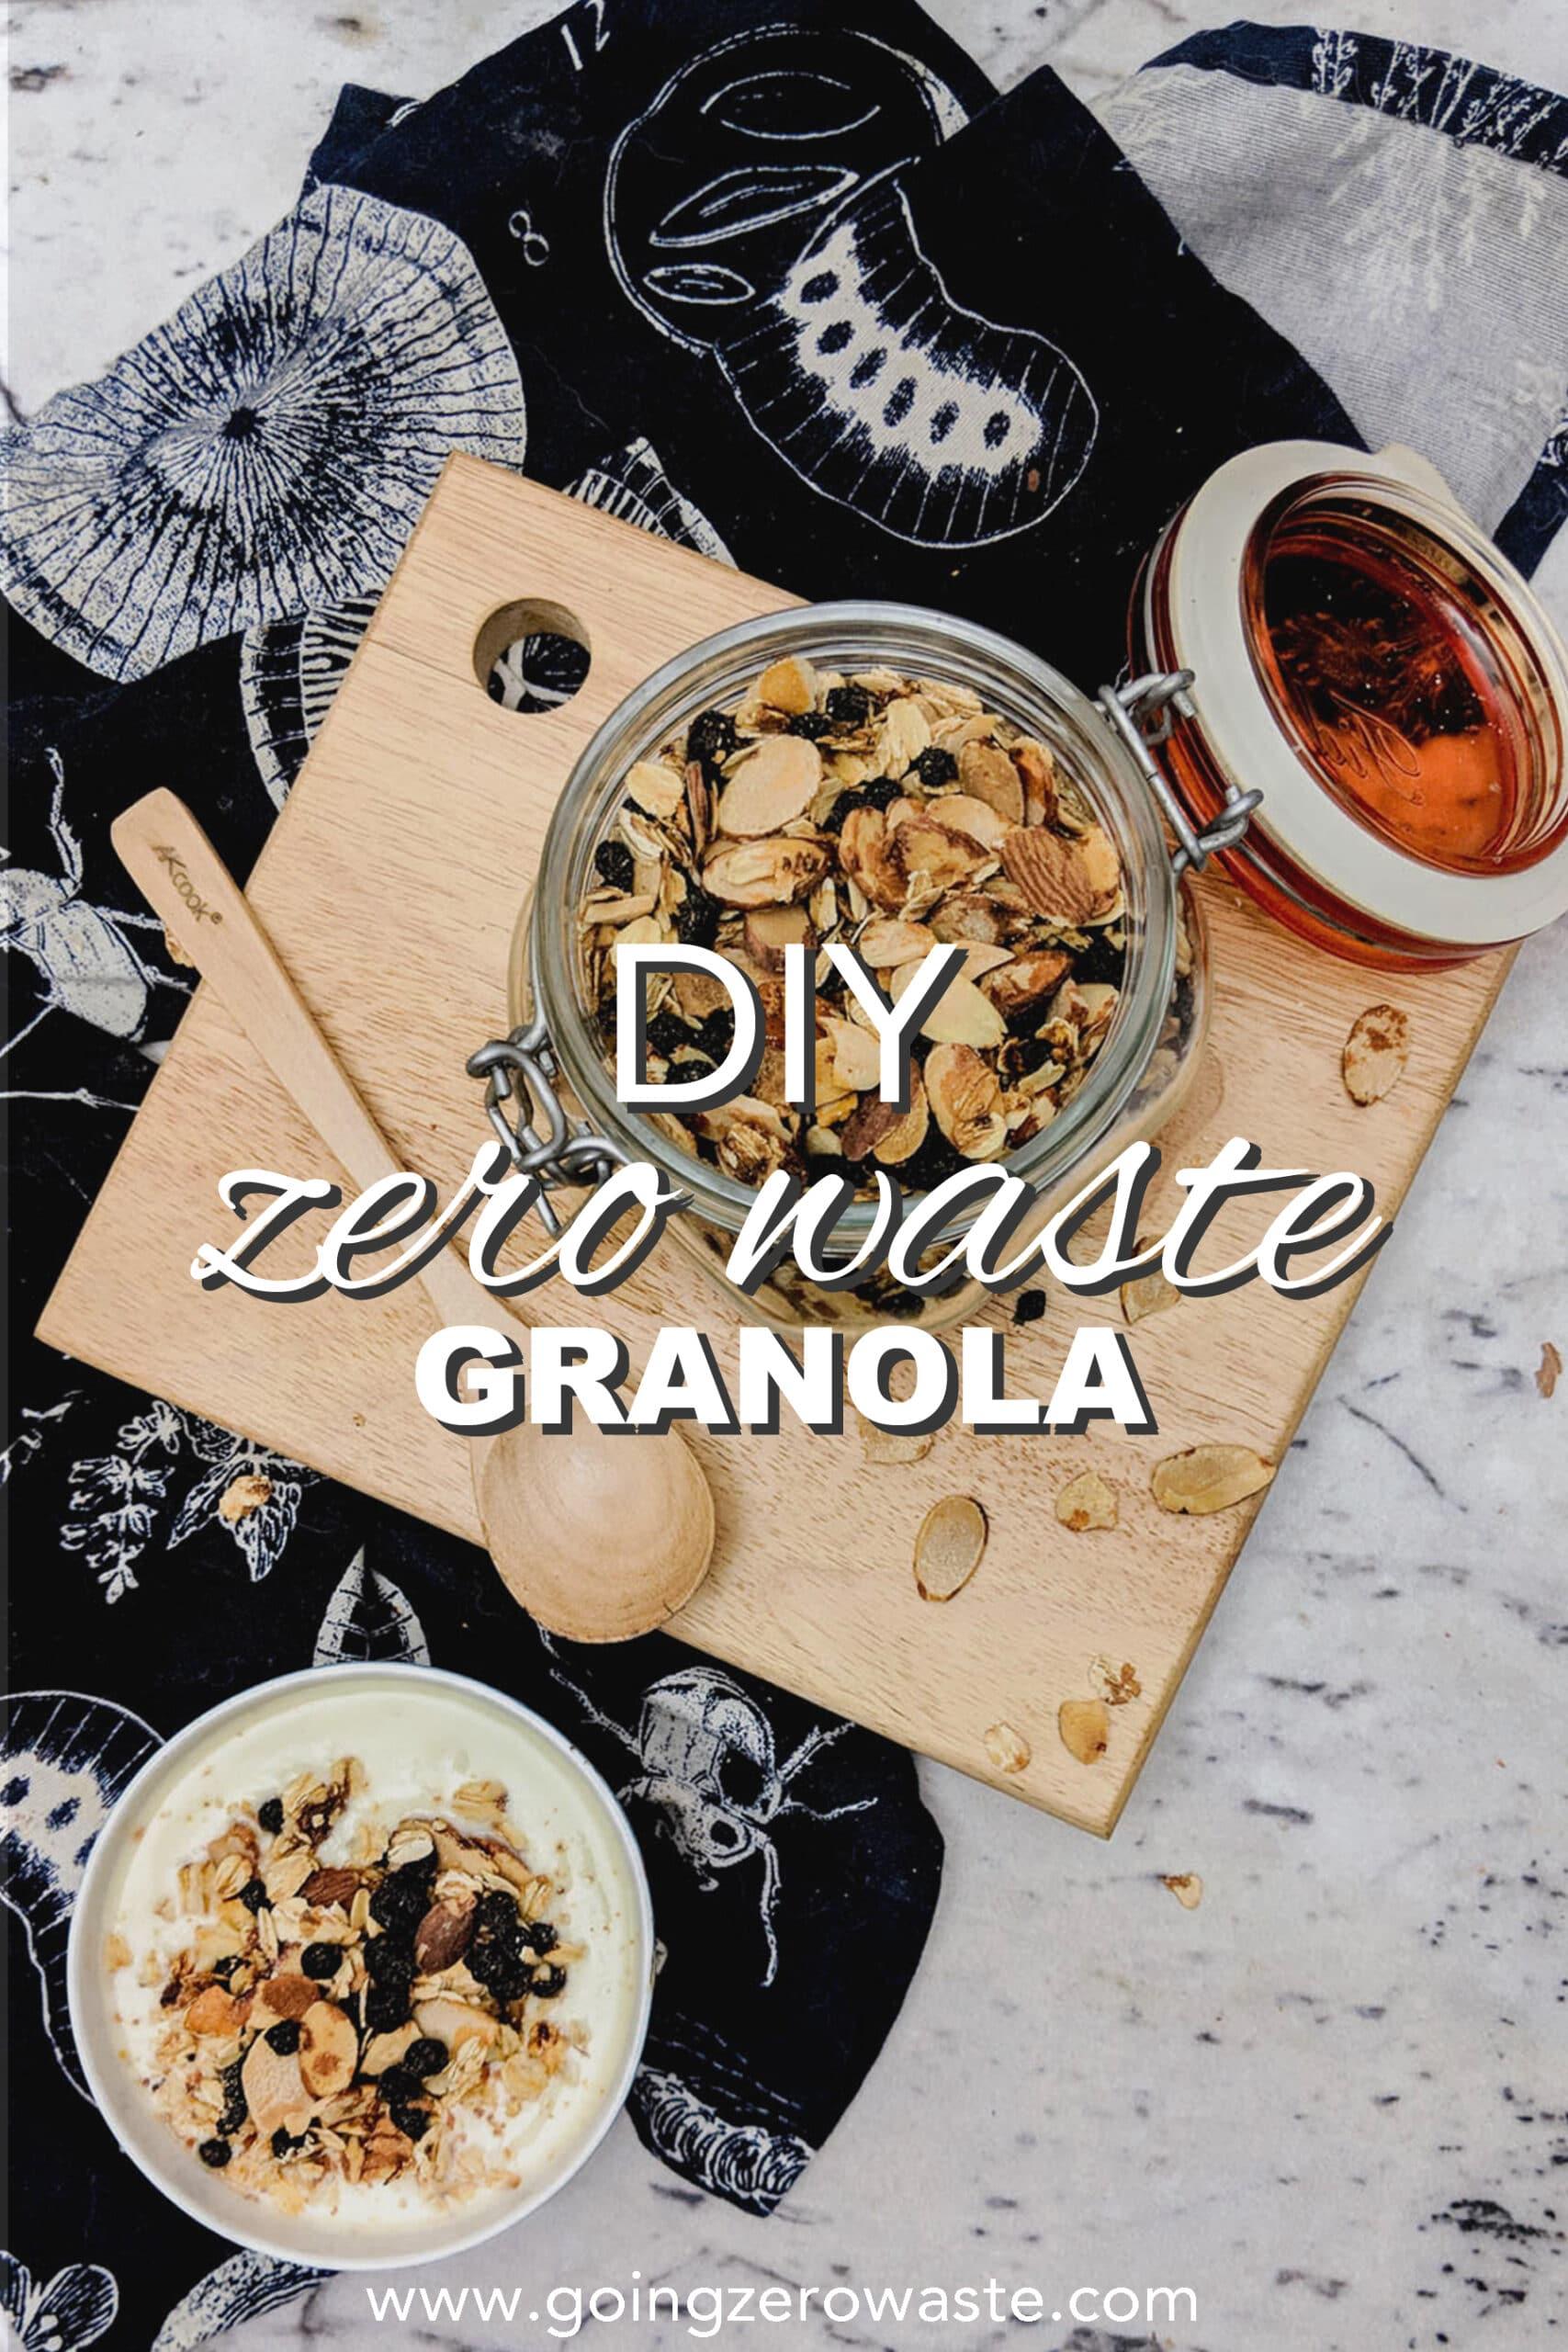 DIY, Zero Waste Granola with Dried Blueberries